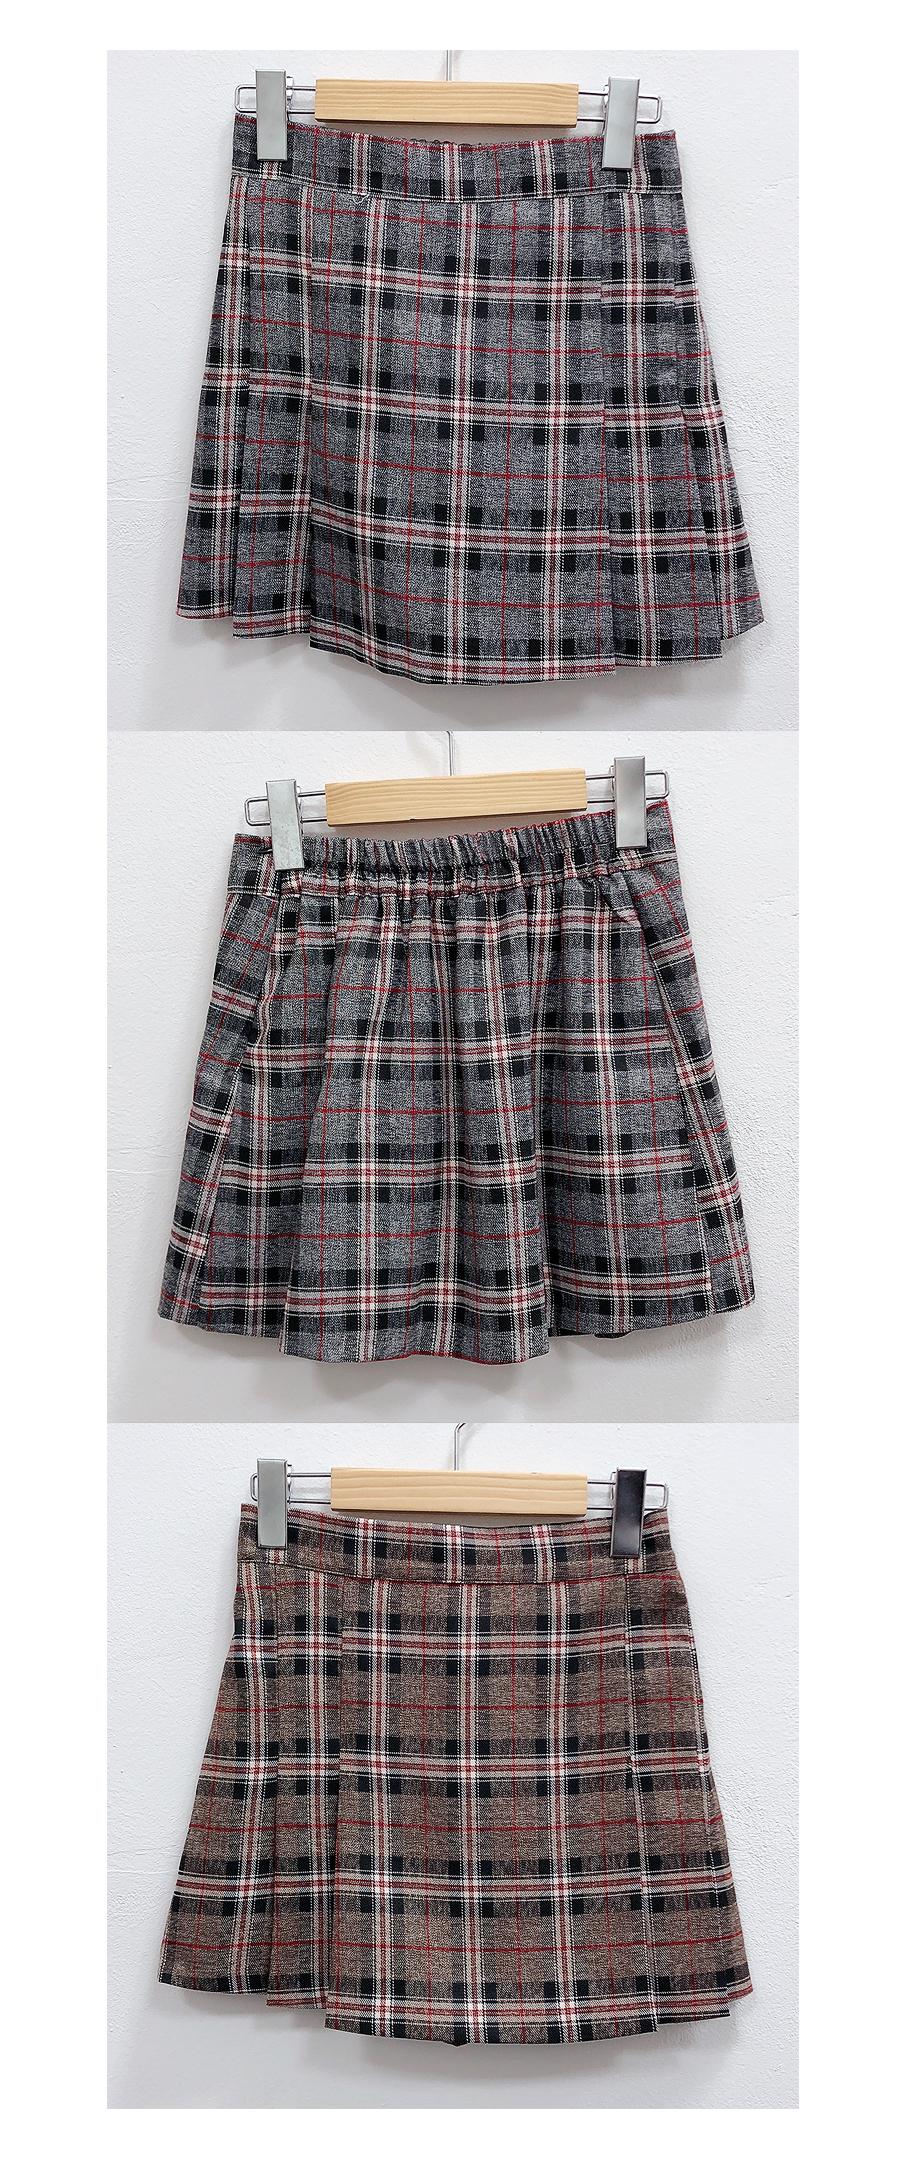 Chex mini skirt pants